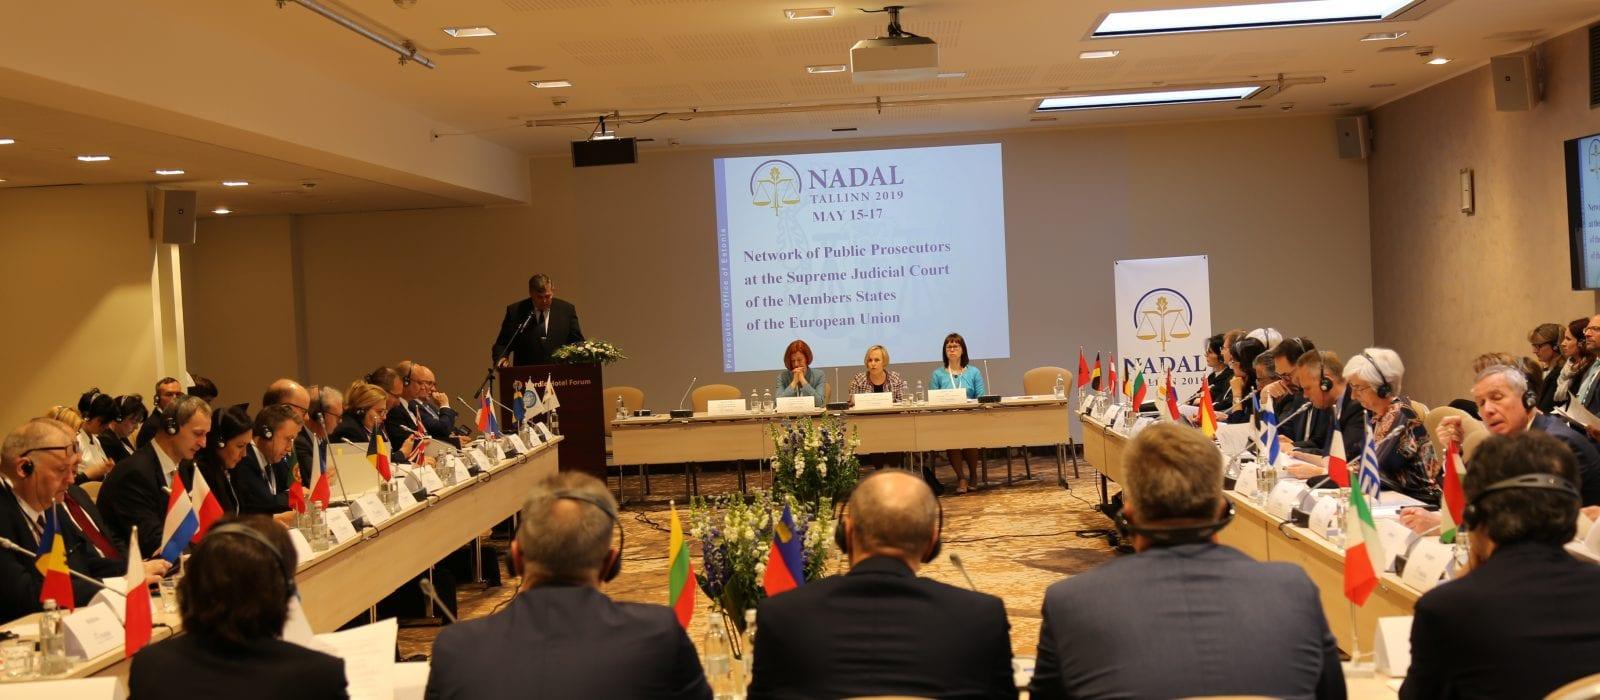 Illustration: NADAL-Netzwerk – Präsidentschaft